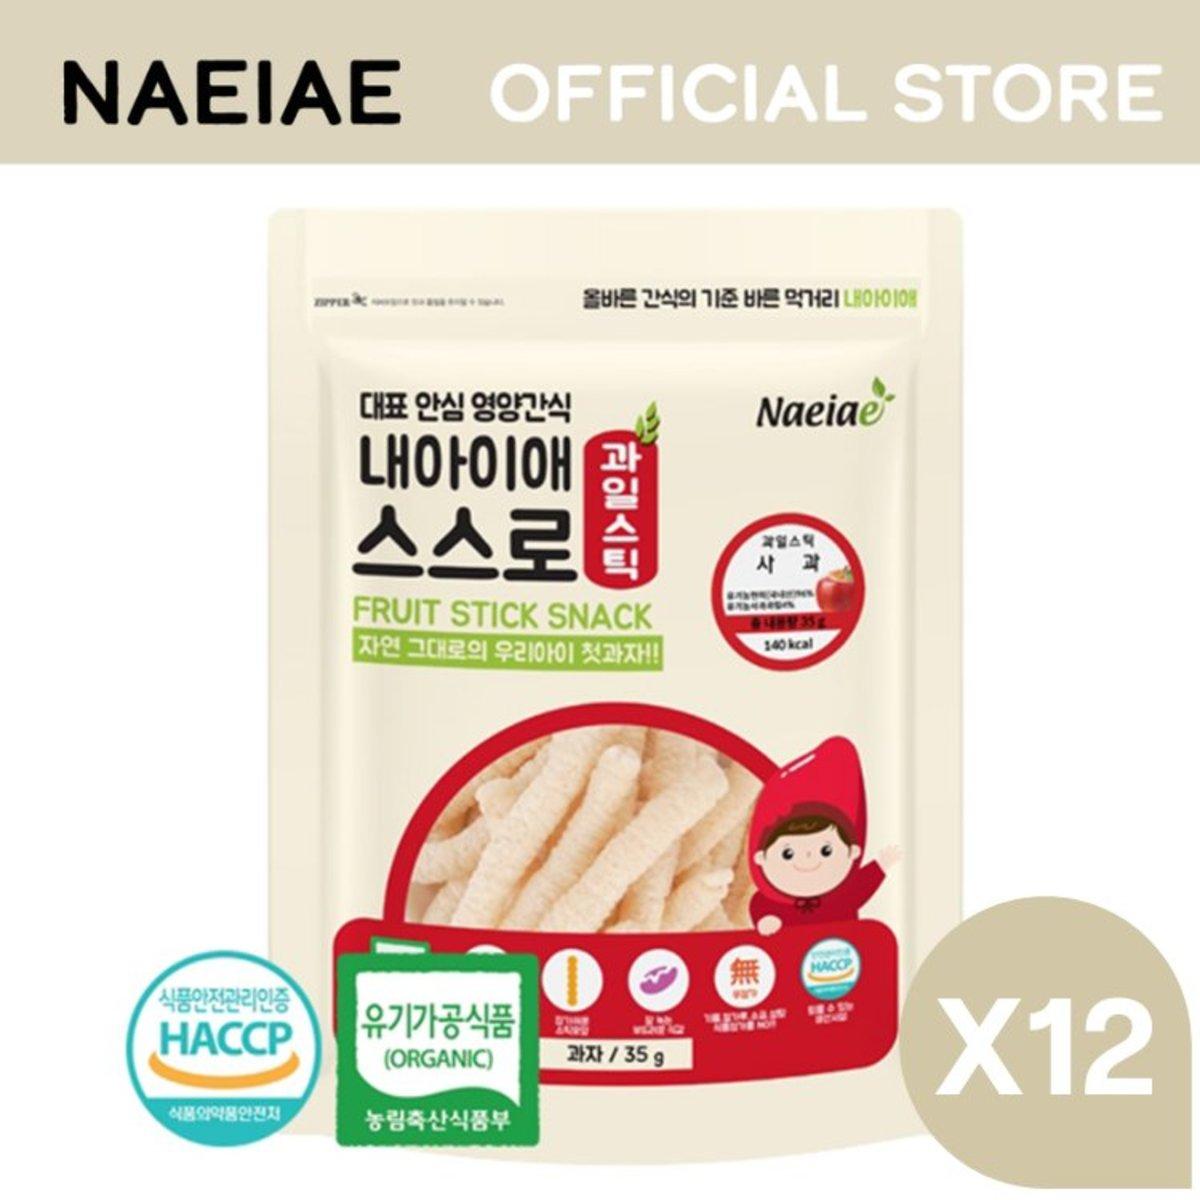 Naeiae 嬰兒有機水果糙米條 - 蘋果 35g X12包